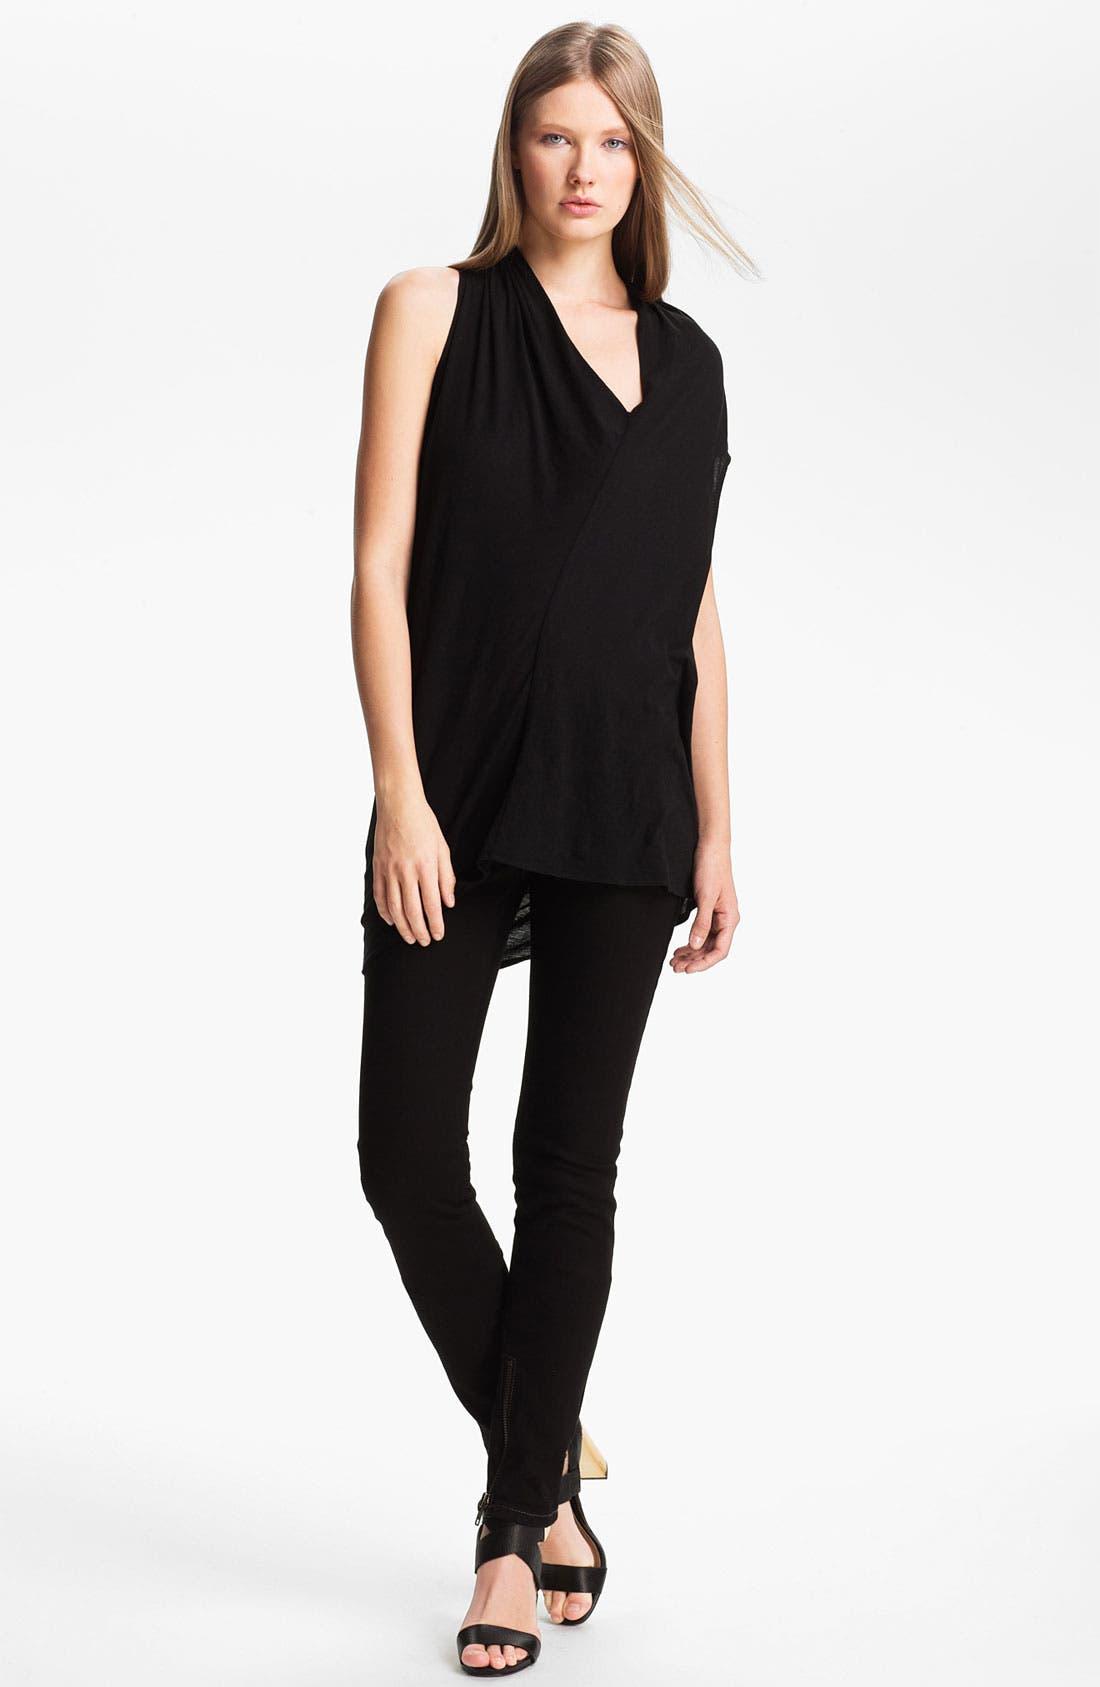 Main Image - Rachel Zoe 'Denise' Asymmetrical Cotton Top